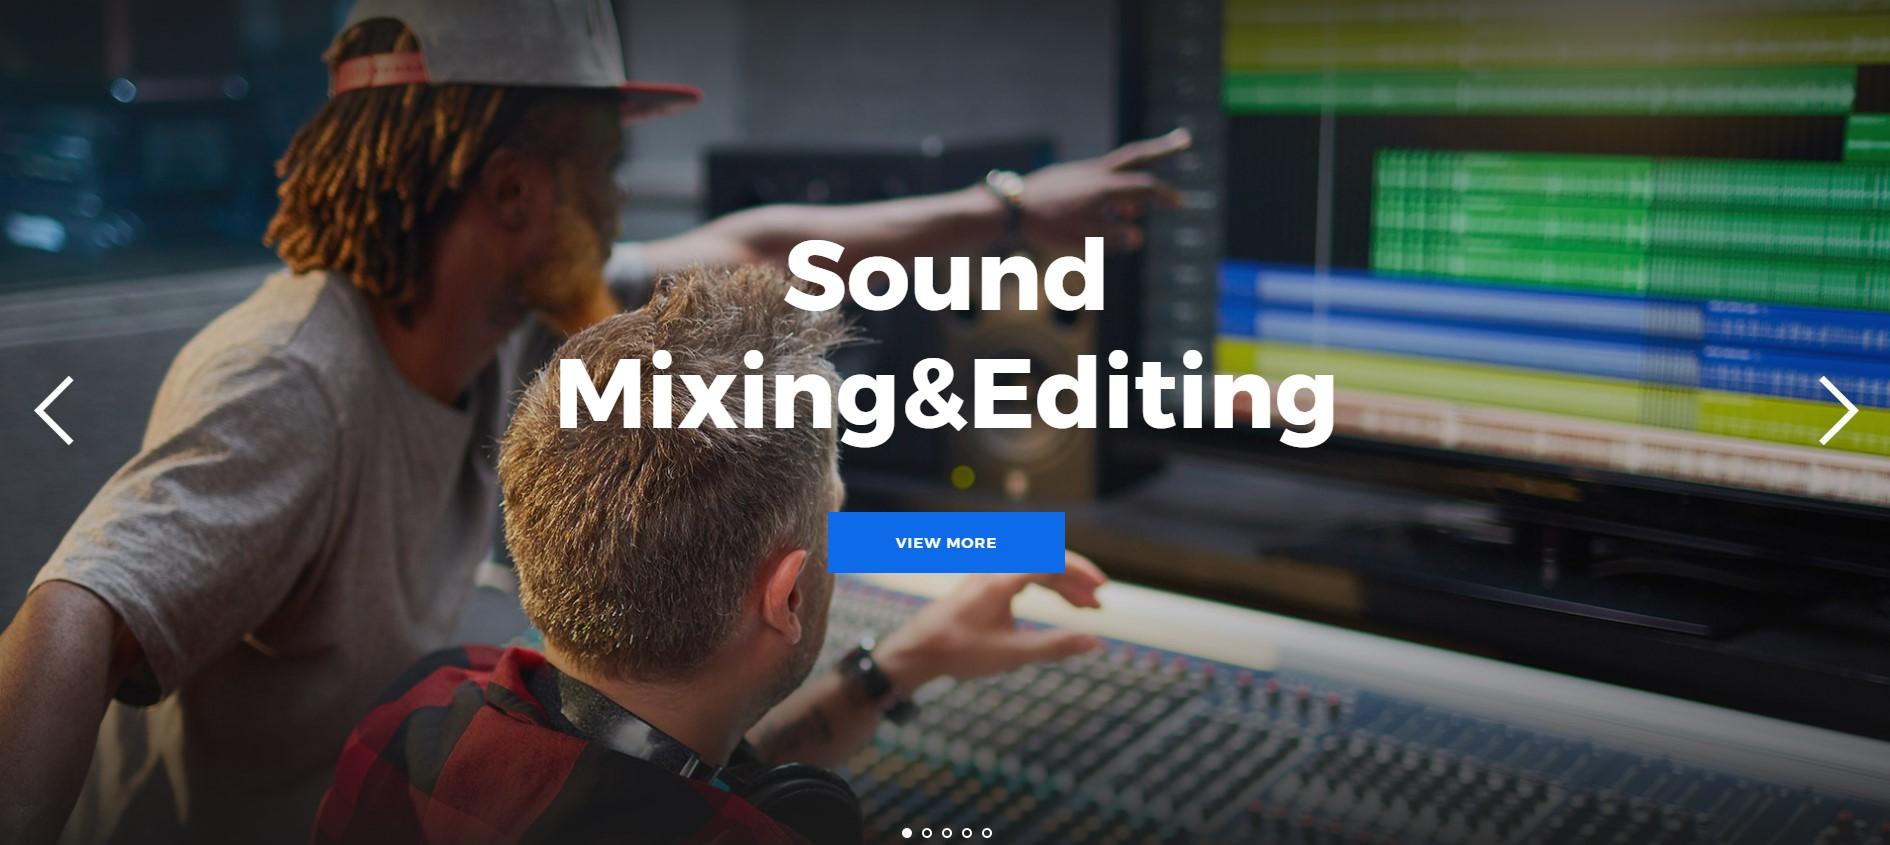 https://documentation.bold-themes.com/music-club/wp-content/uploads/sites/19/2017/07/slider.jpg